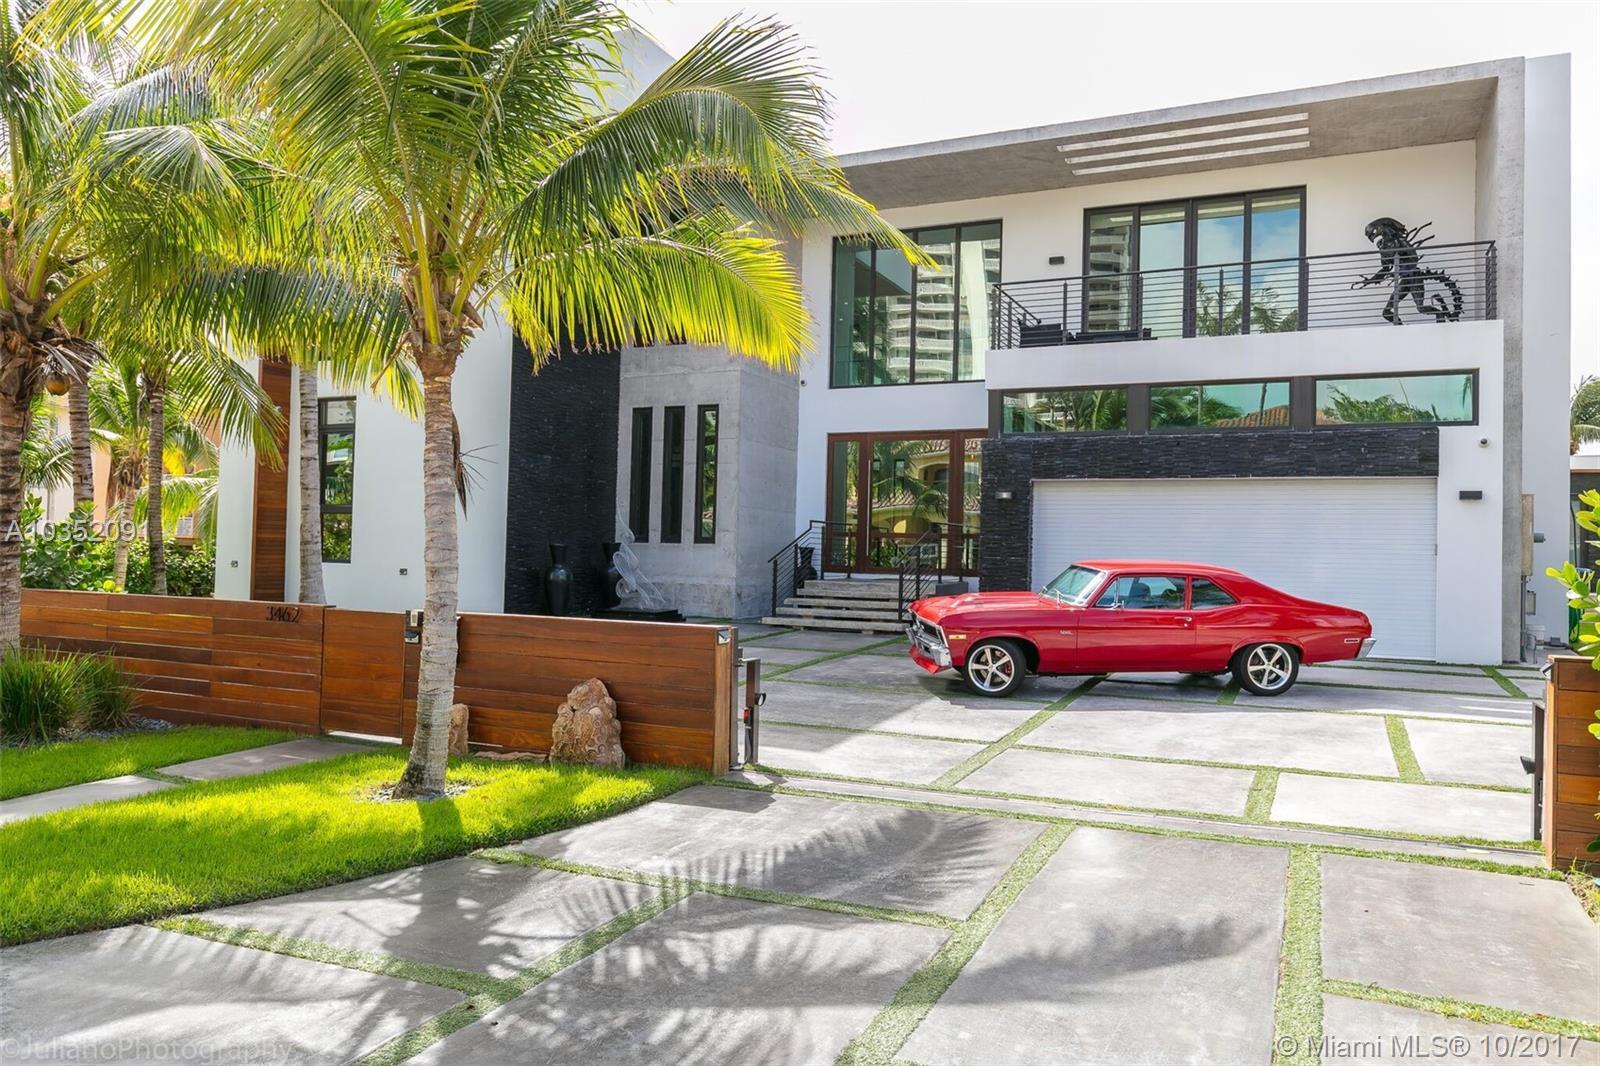 3462 NE 171st St - North Miami Beach, Florida